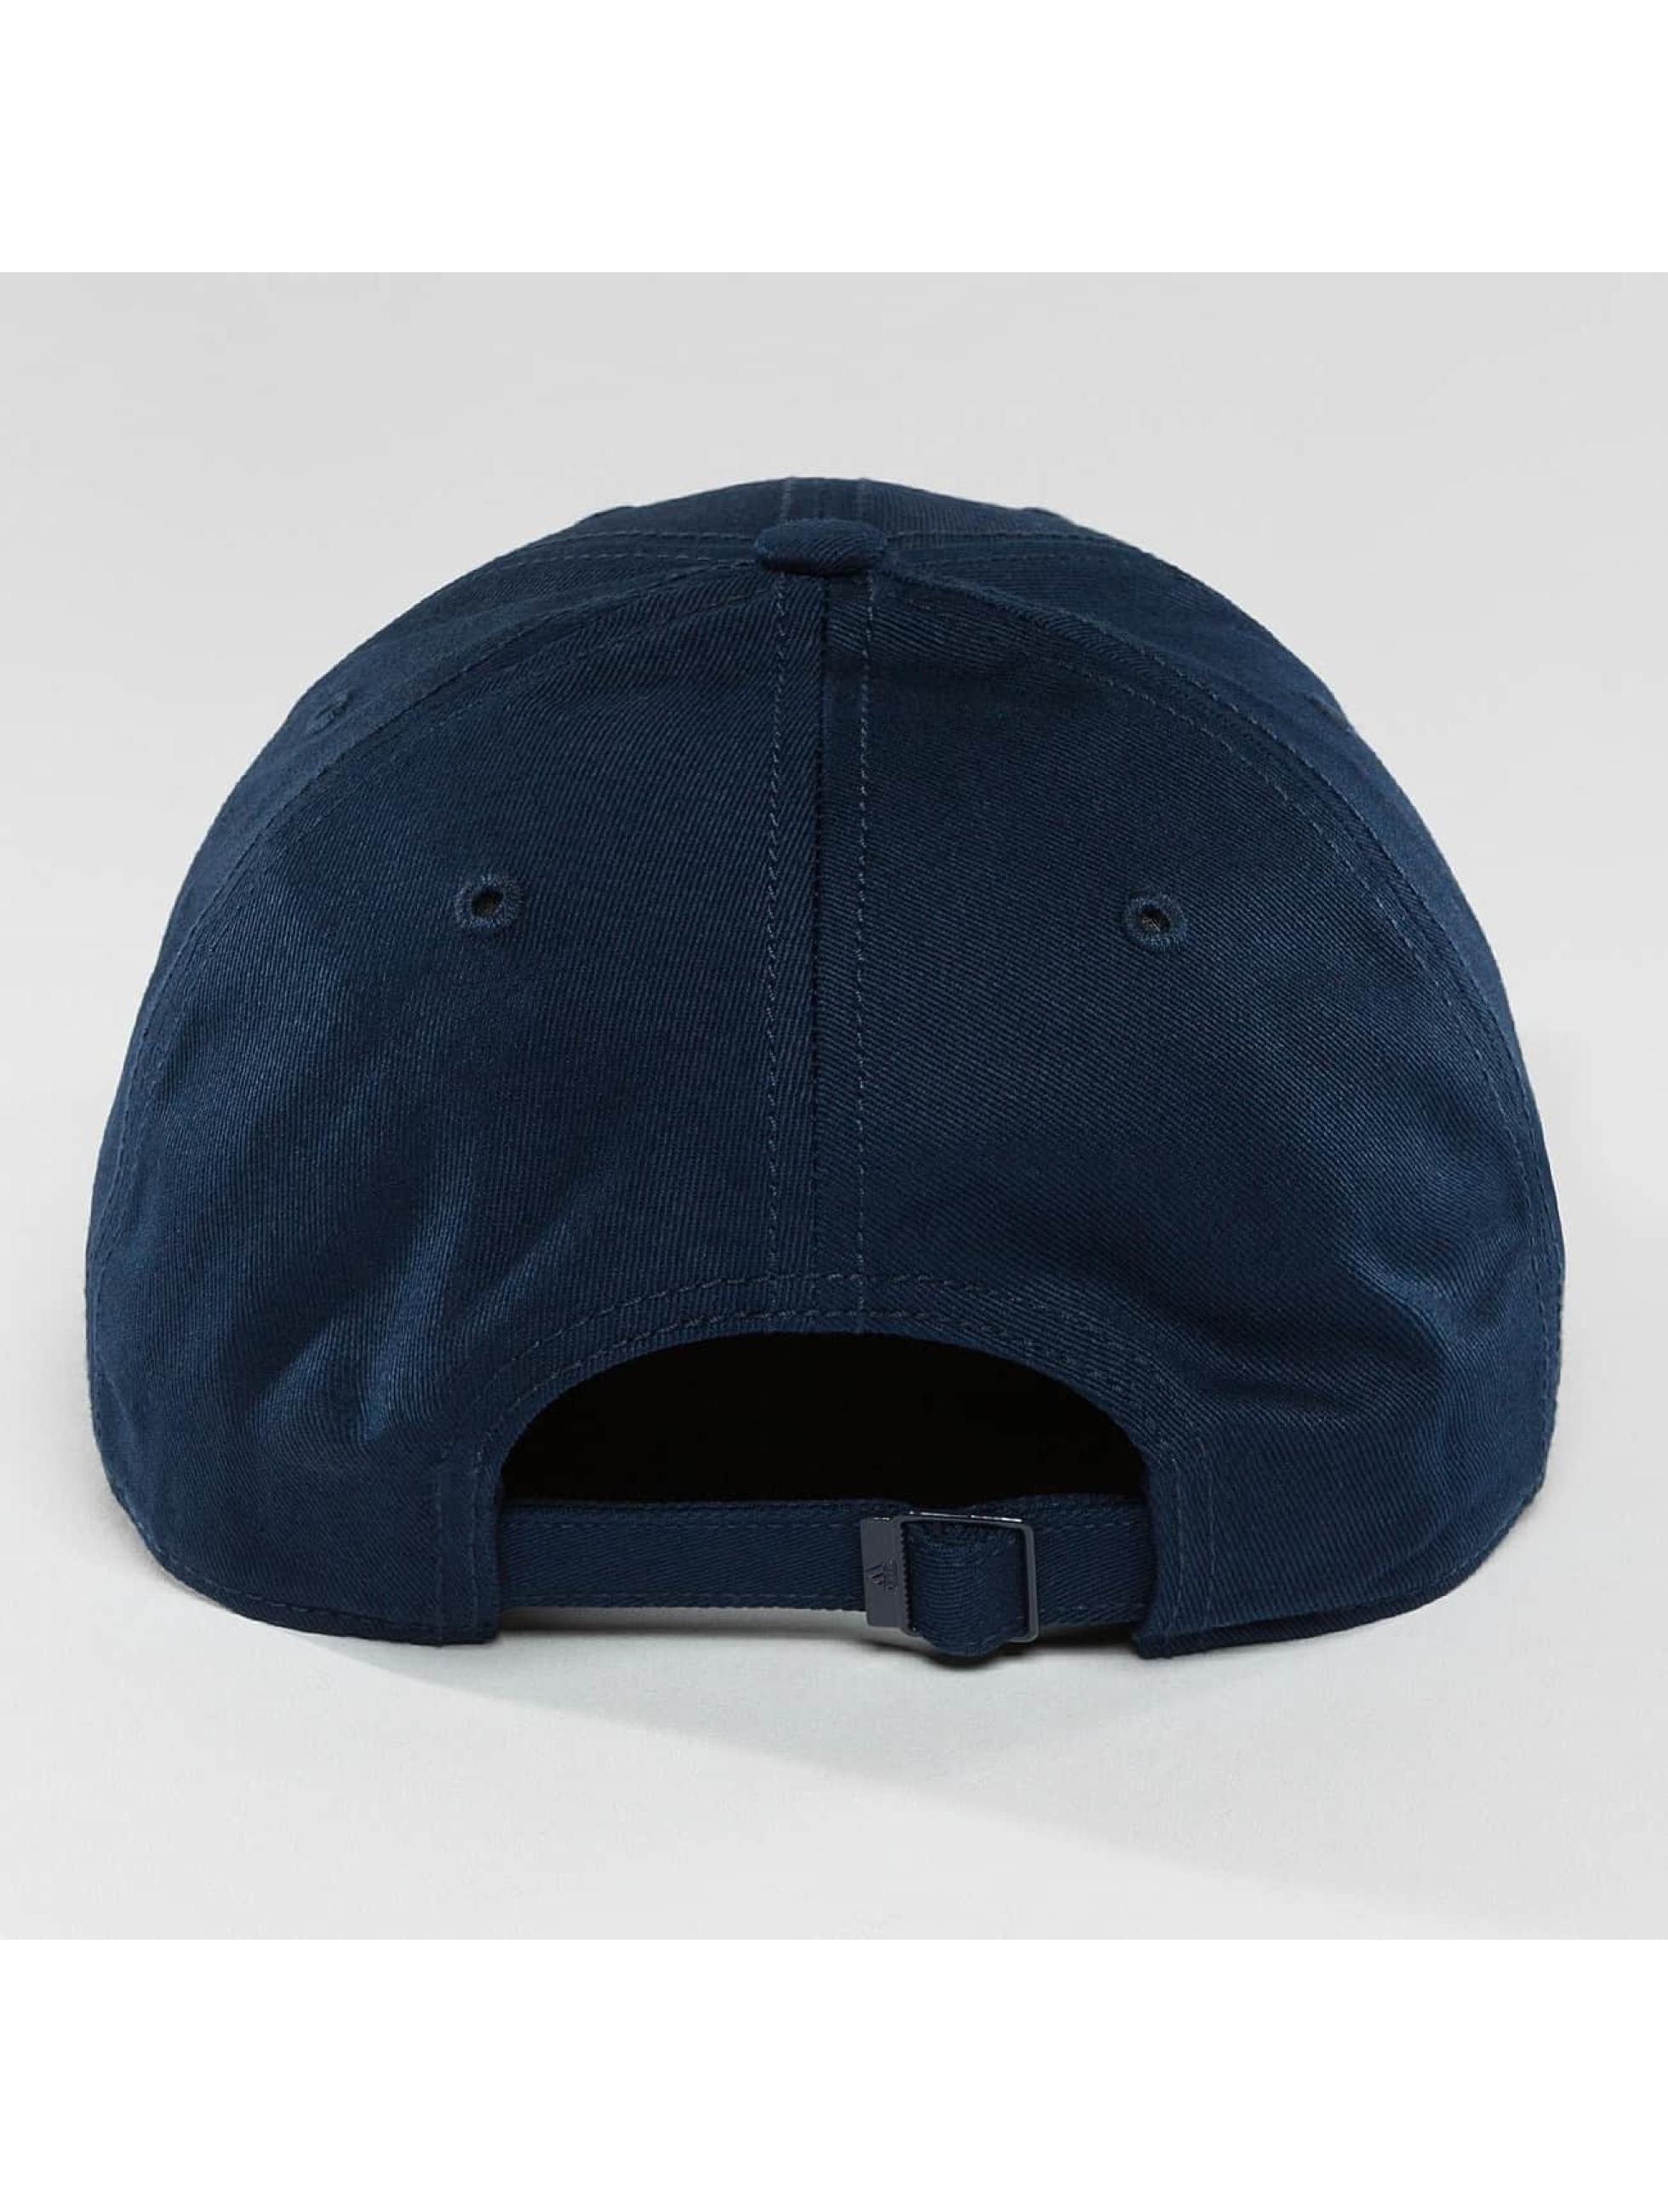 adidas Performance Gorra Snapback Snapback Cap azul